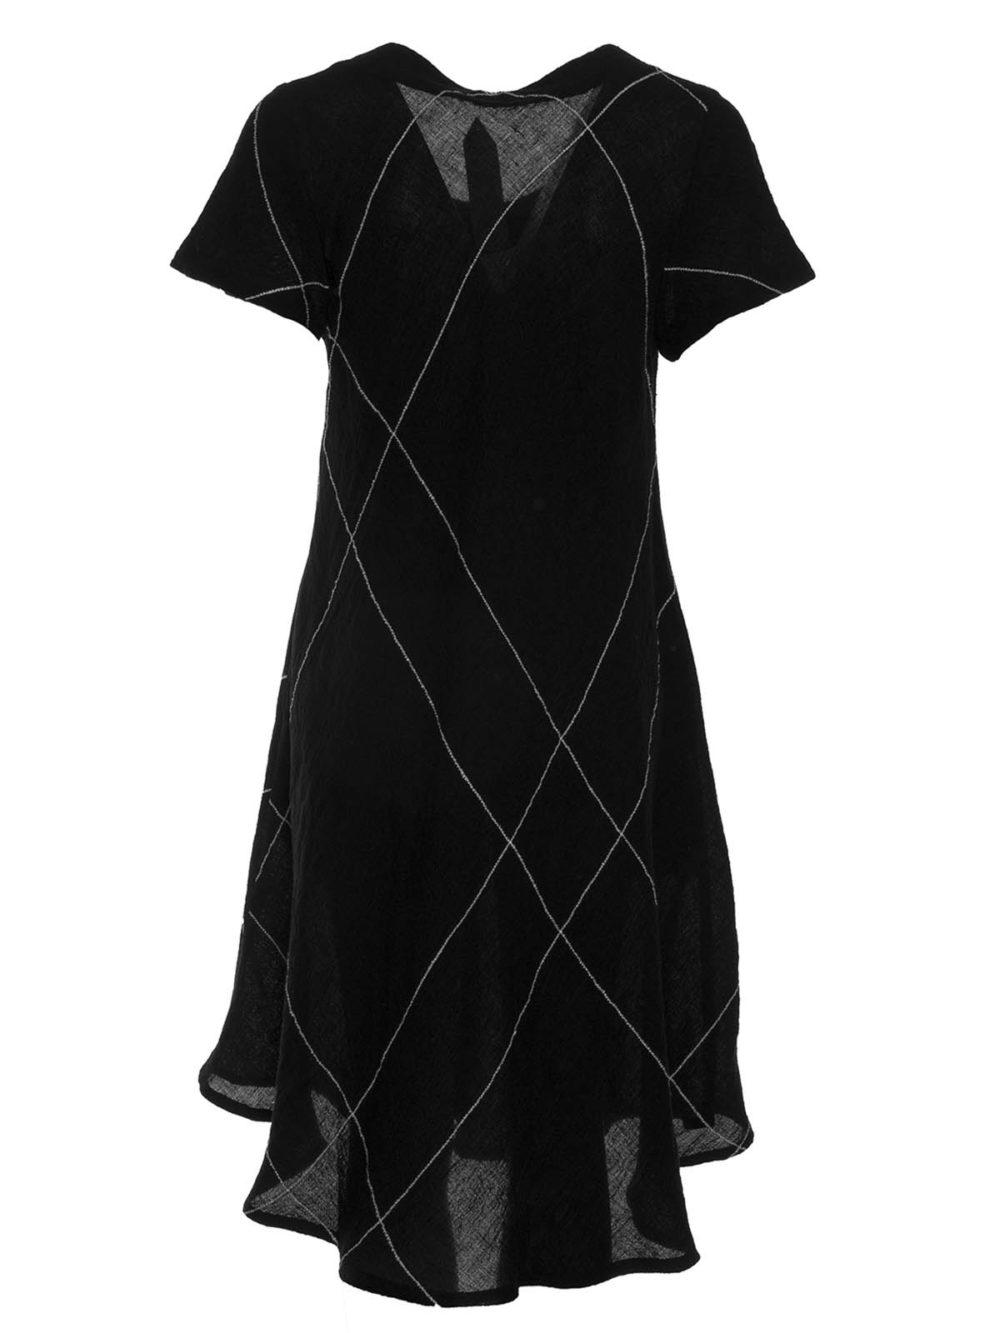 Kaya Dress Ralston Katie Kerr Women's Clothing